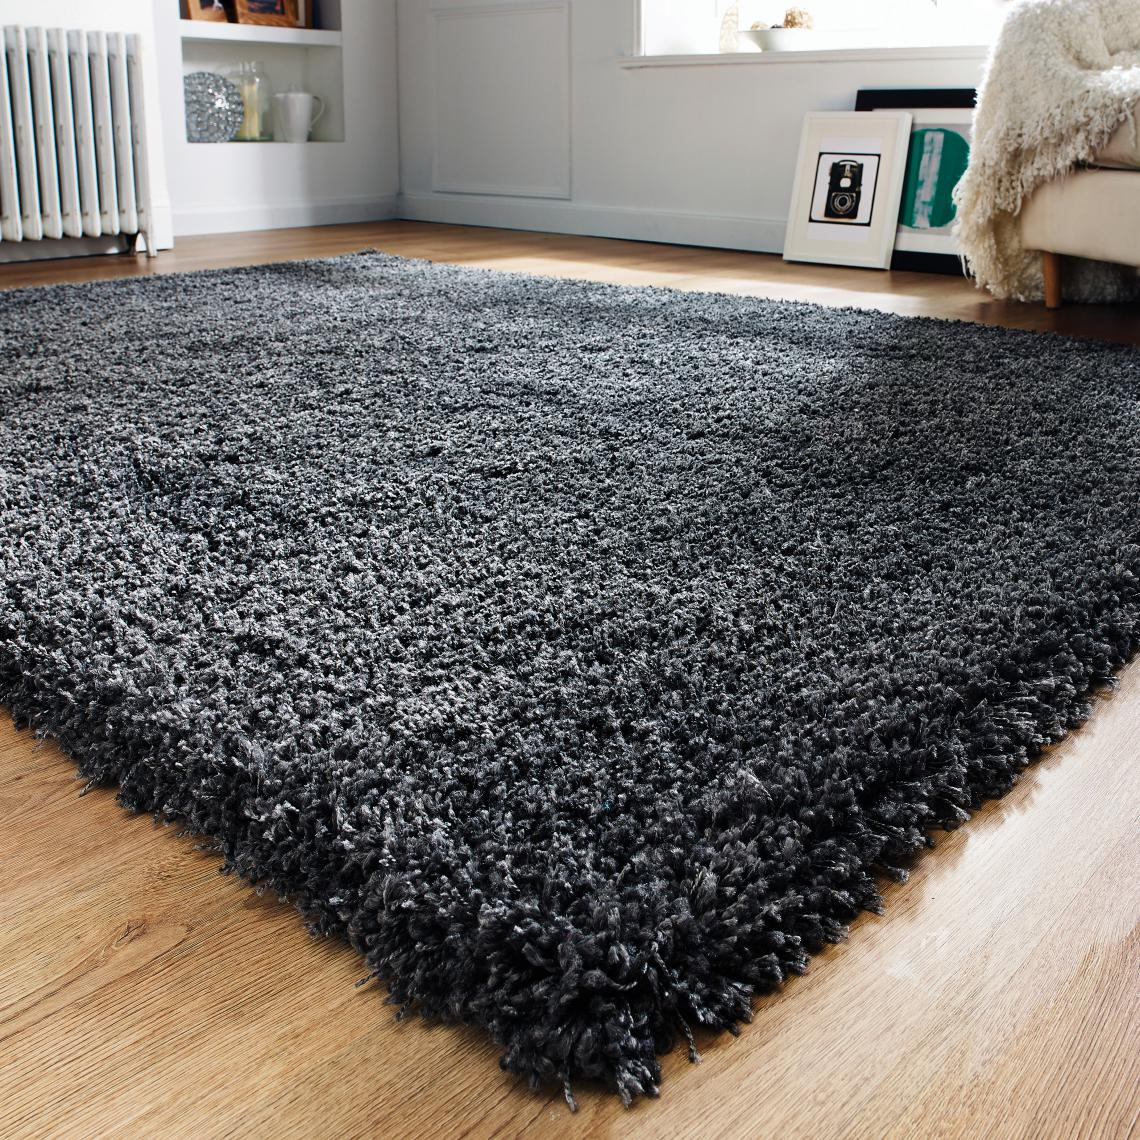 Tapis à Poils Longs Noir 170x120cm IZANE Z0hkF